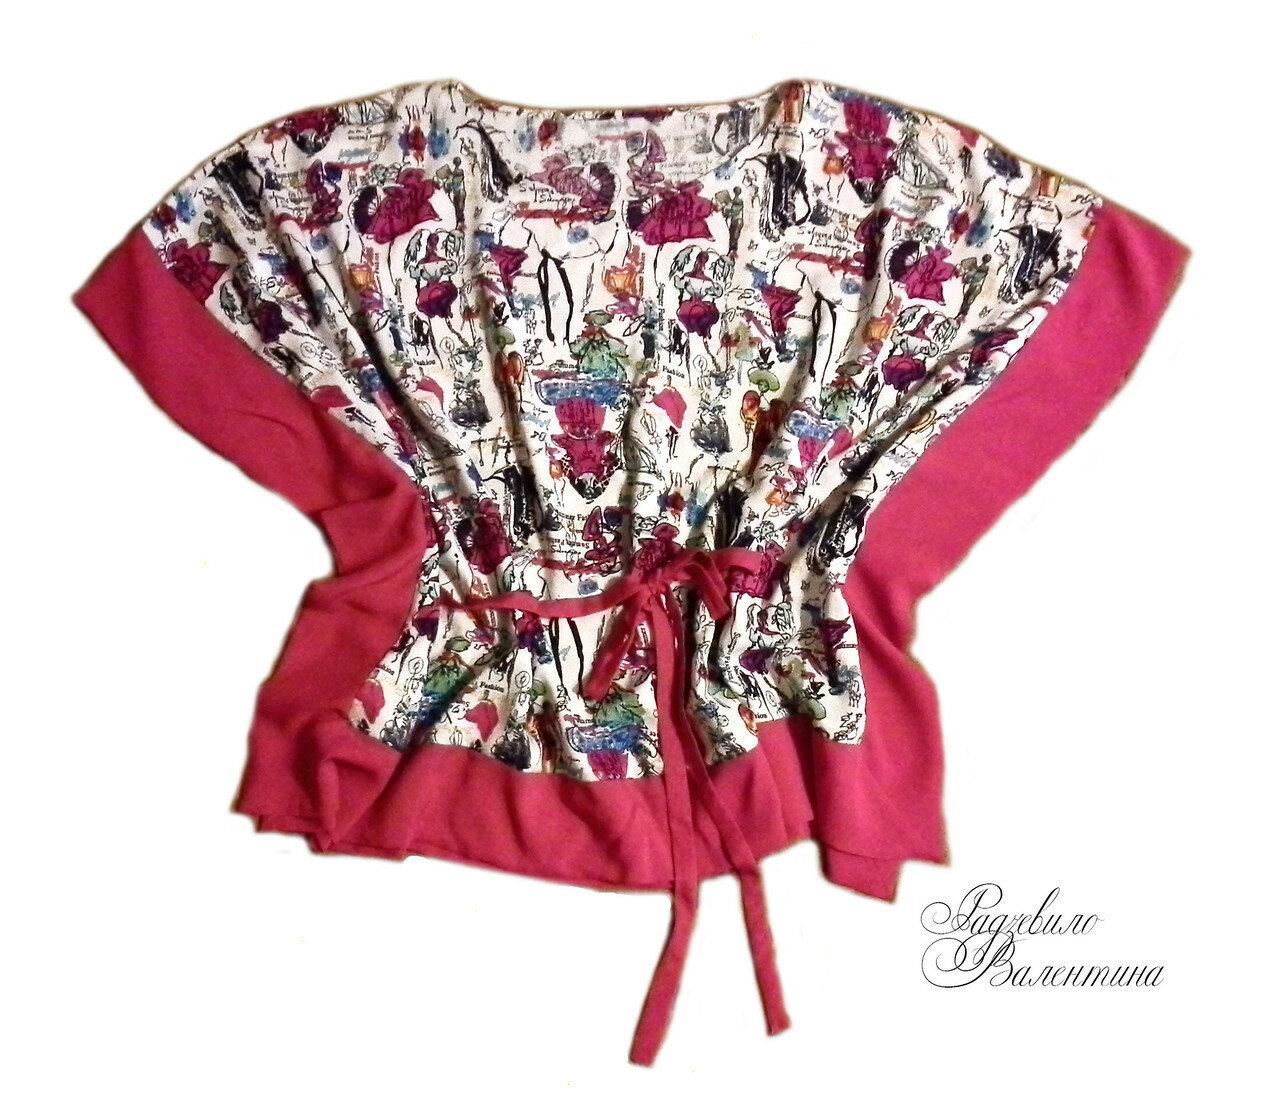 Блузка разлетайка в москве